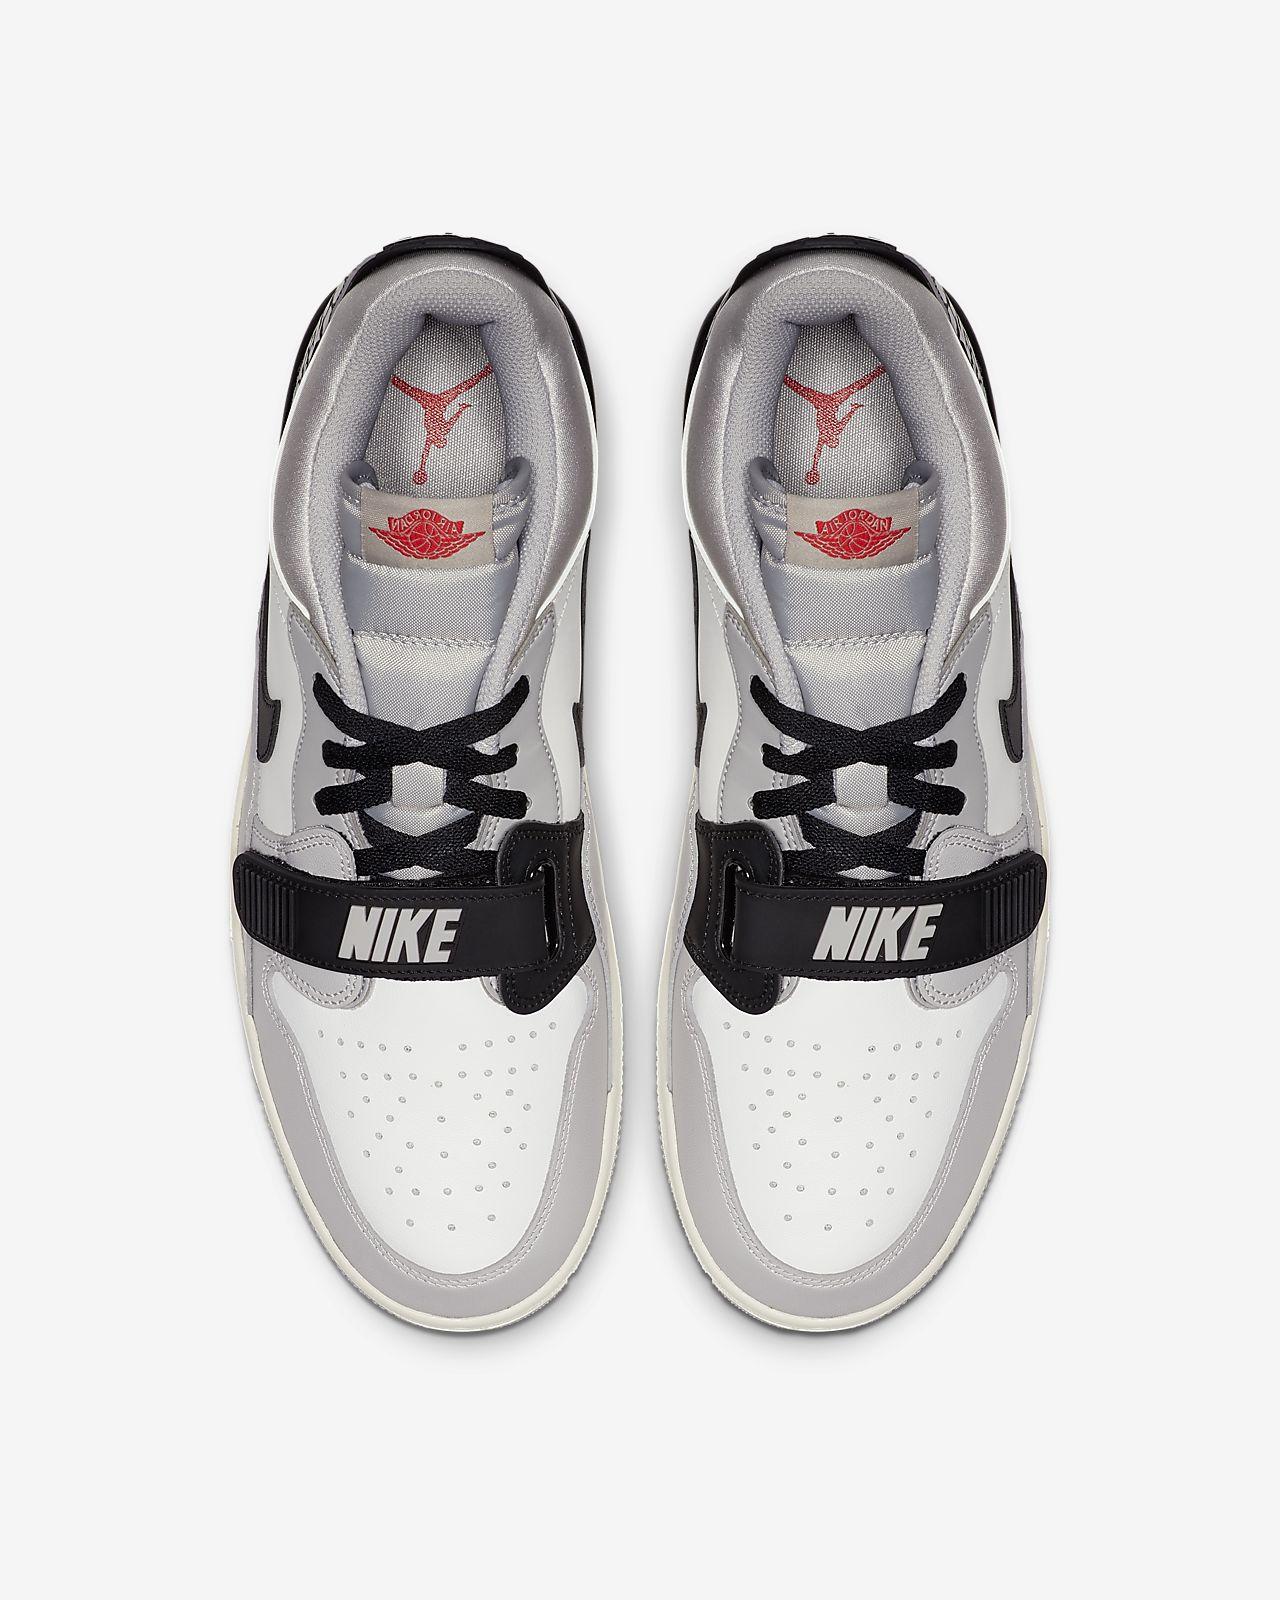 promo code 4e0f2 ac5d6 ... Air Jordan Legacy 312 Low Men s Shoe